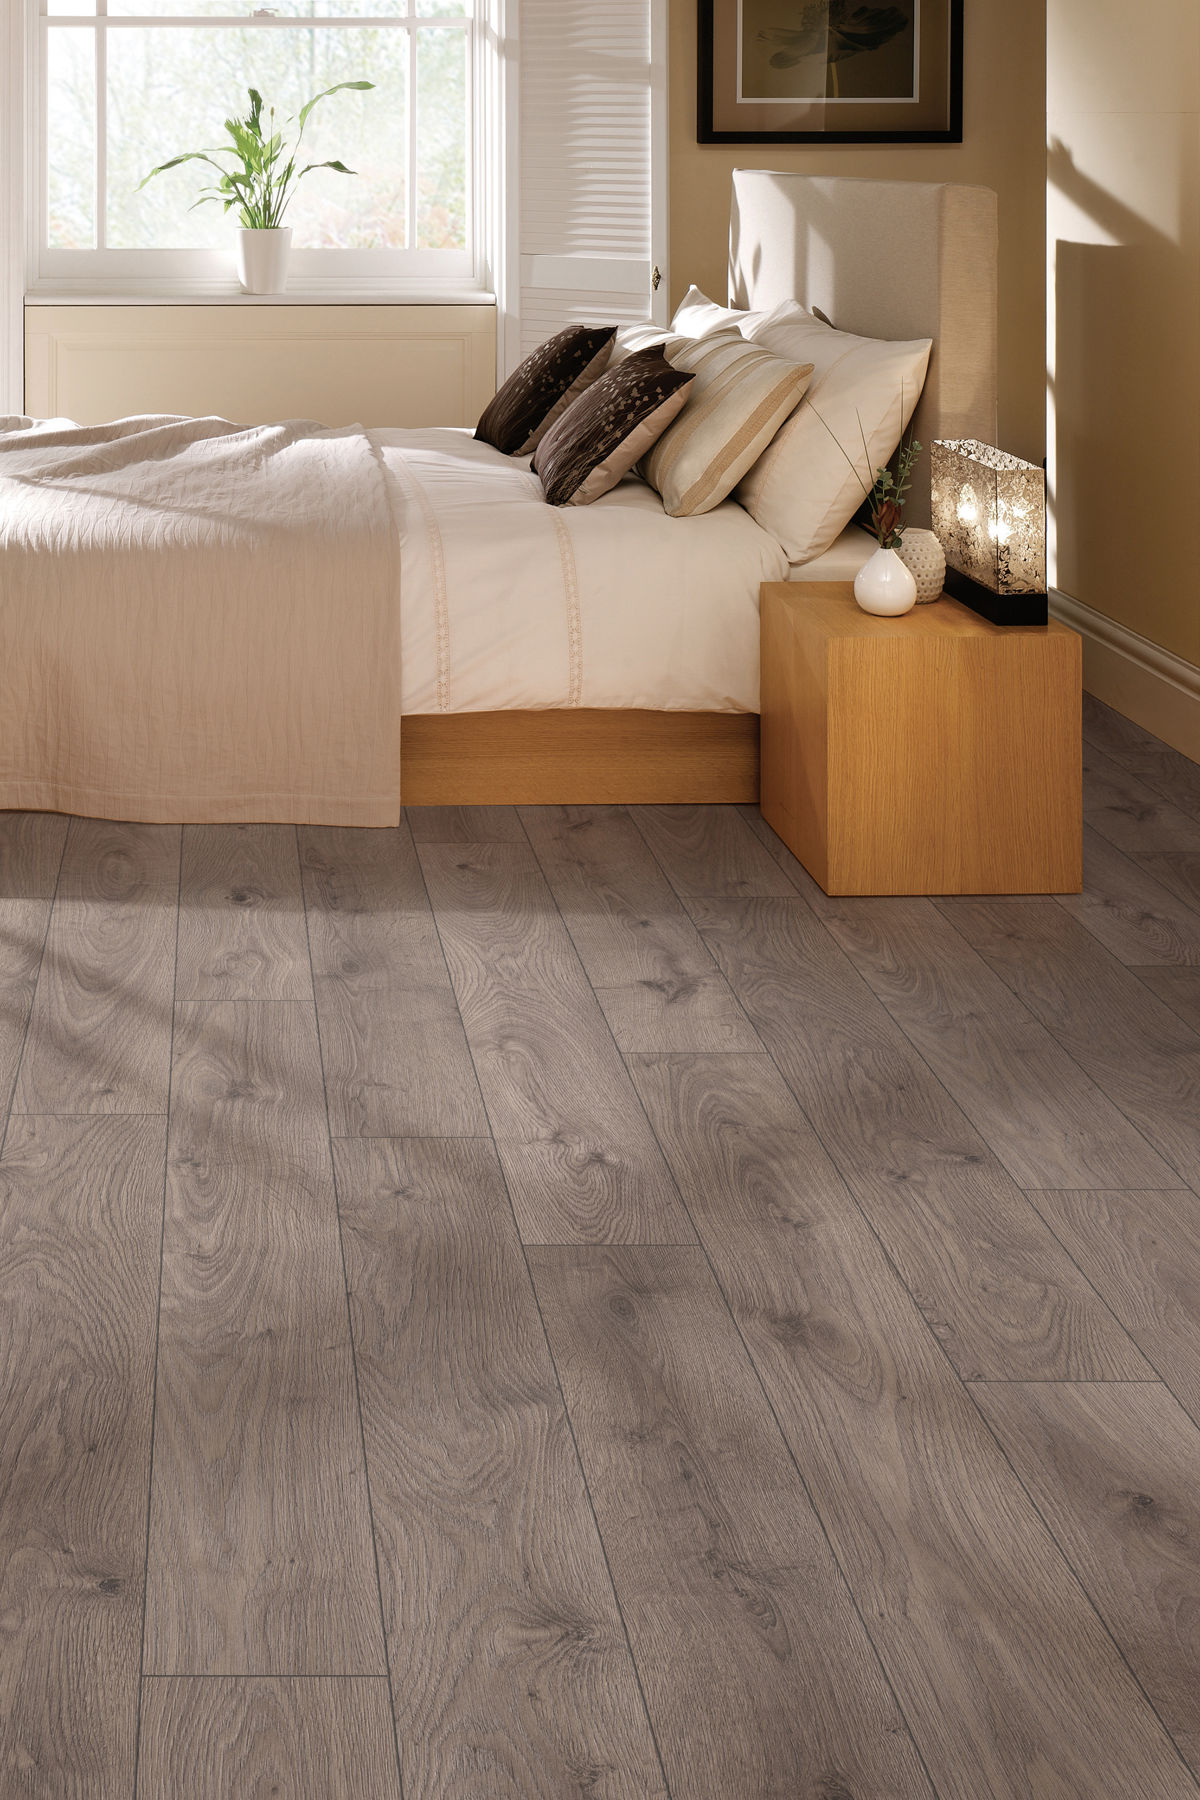 Kronospan Vario San Diego Oak Laminate Flooring